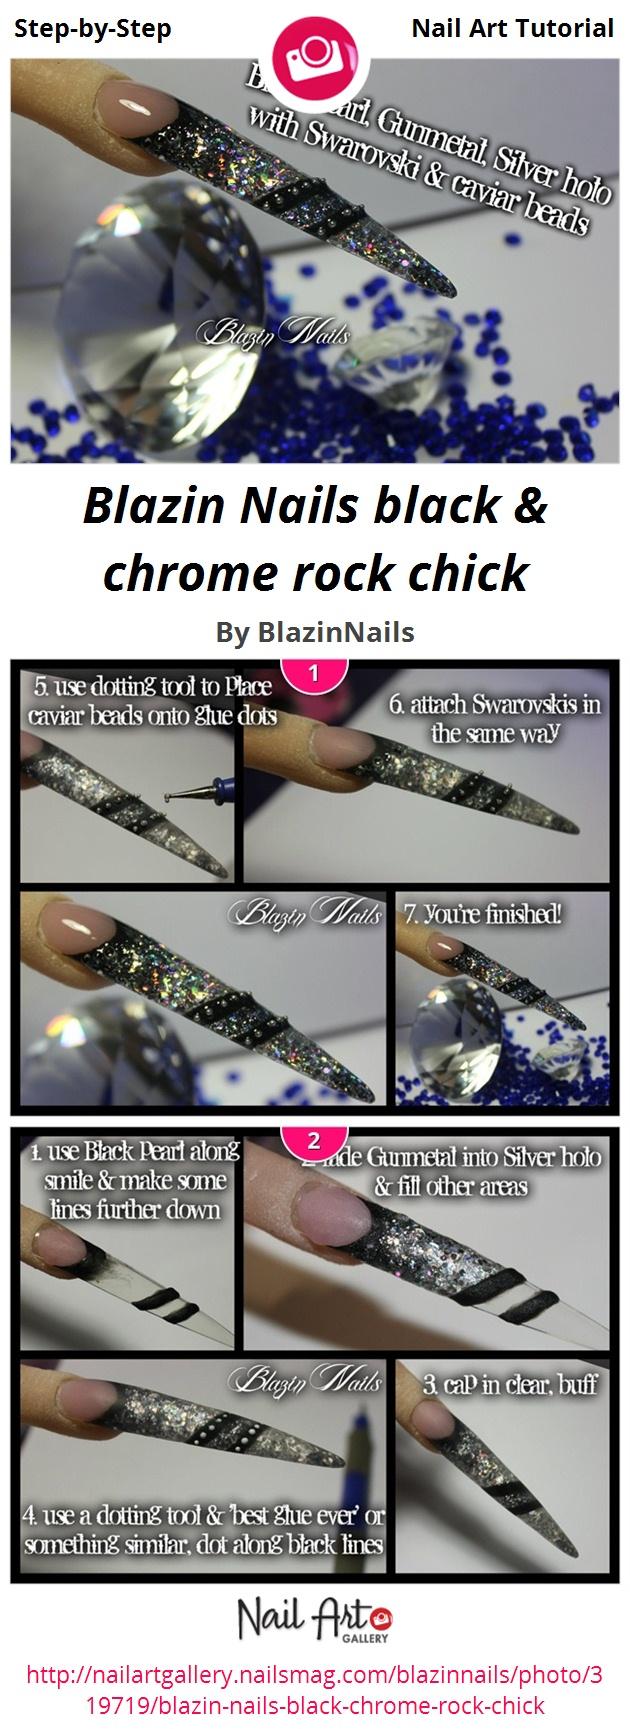 Blazin Nails black & chrome rock chick - Nail Art Gallery